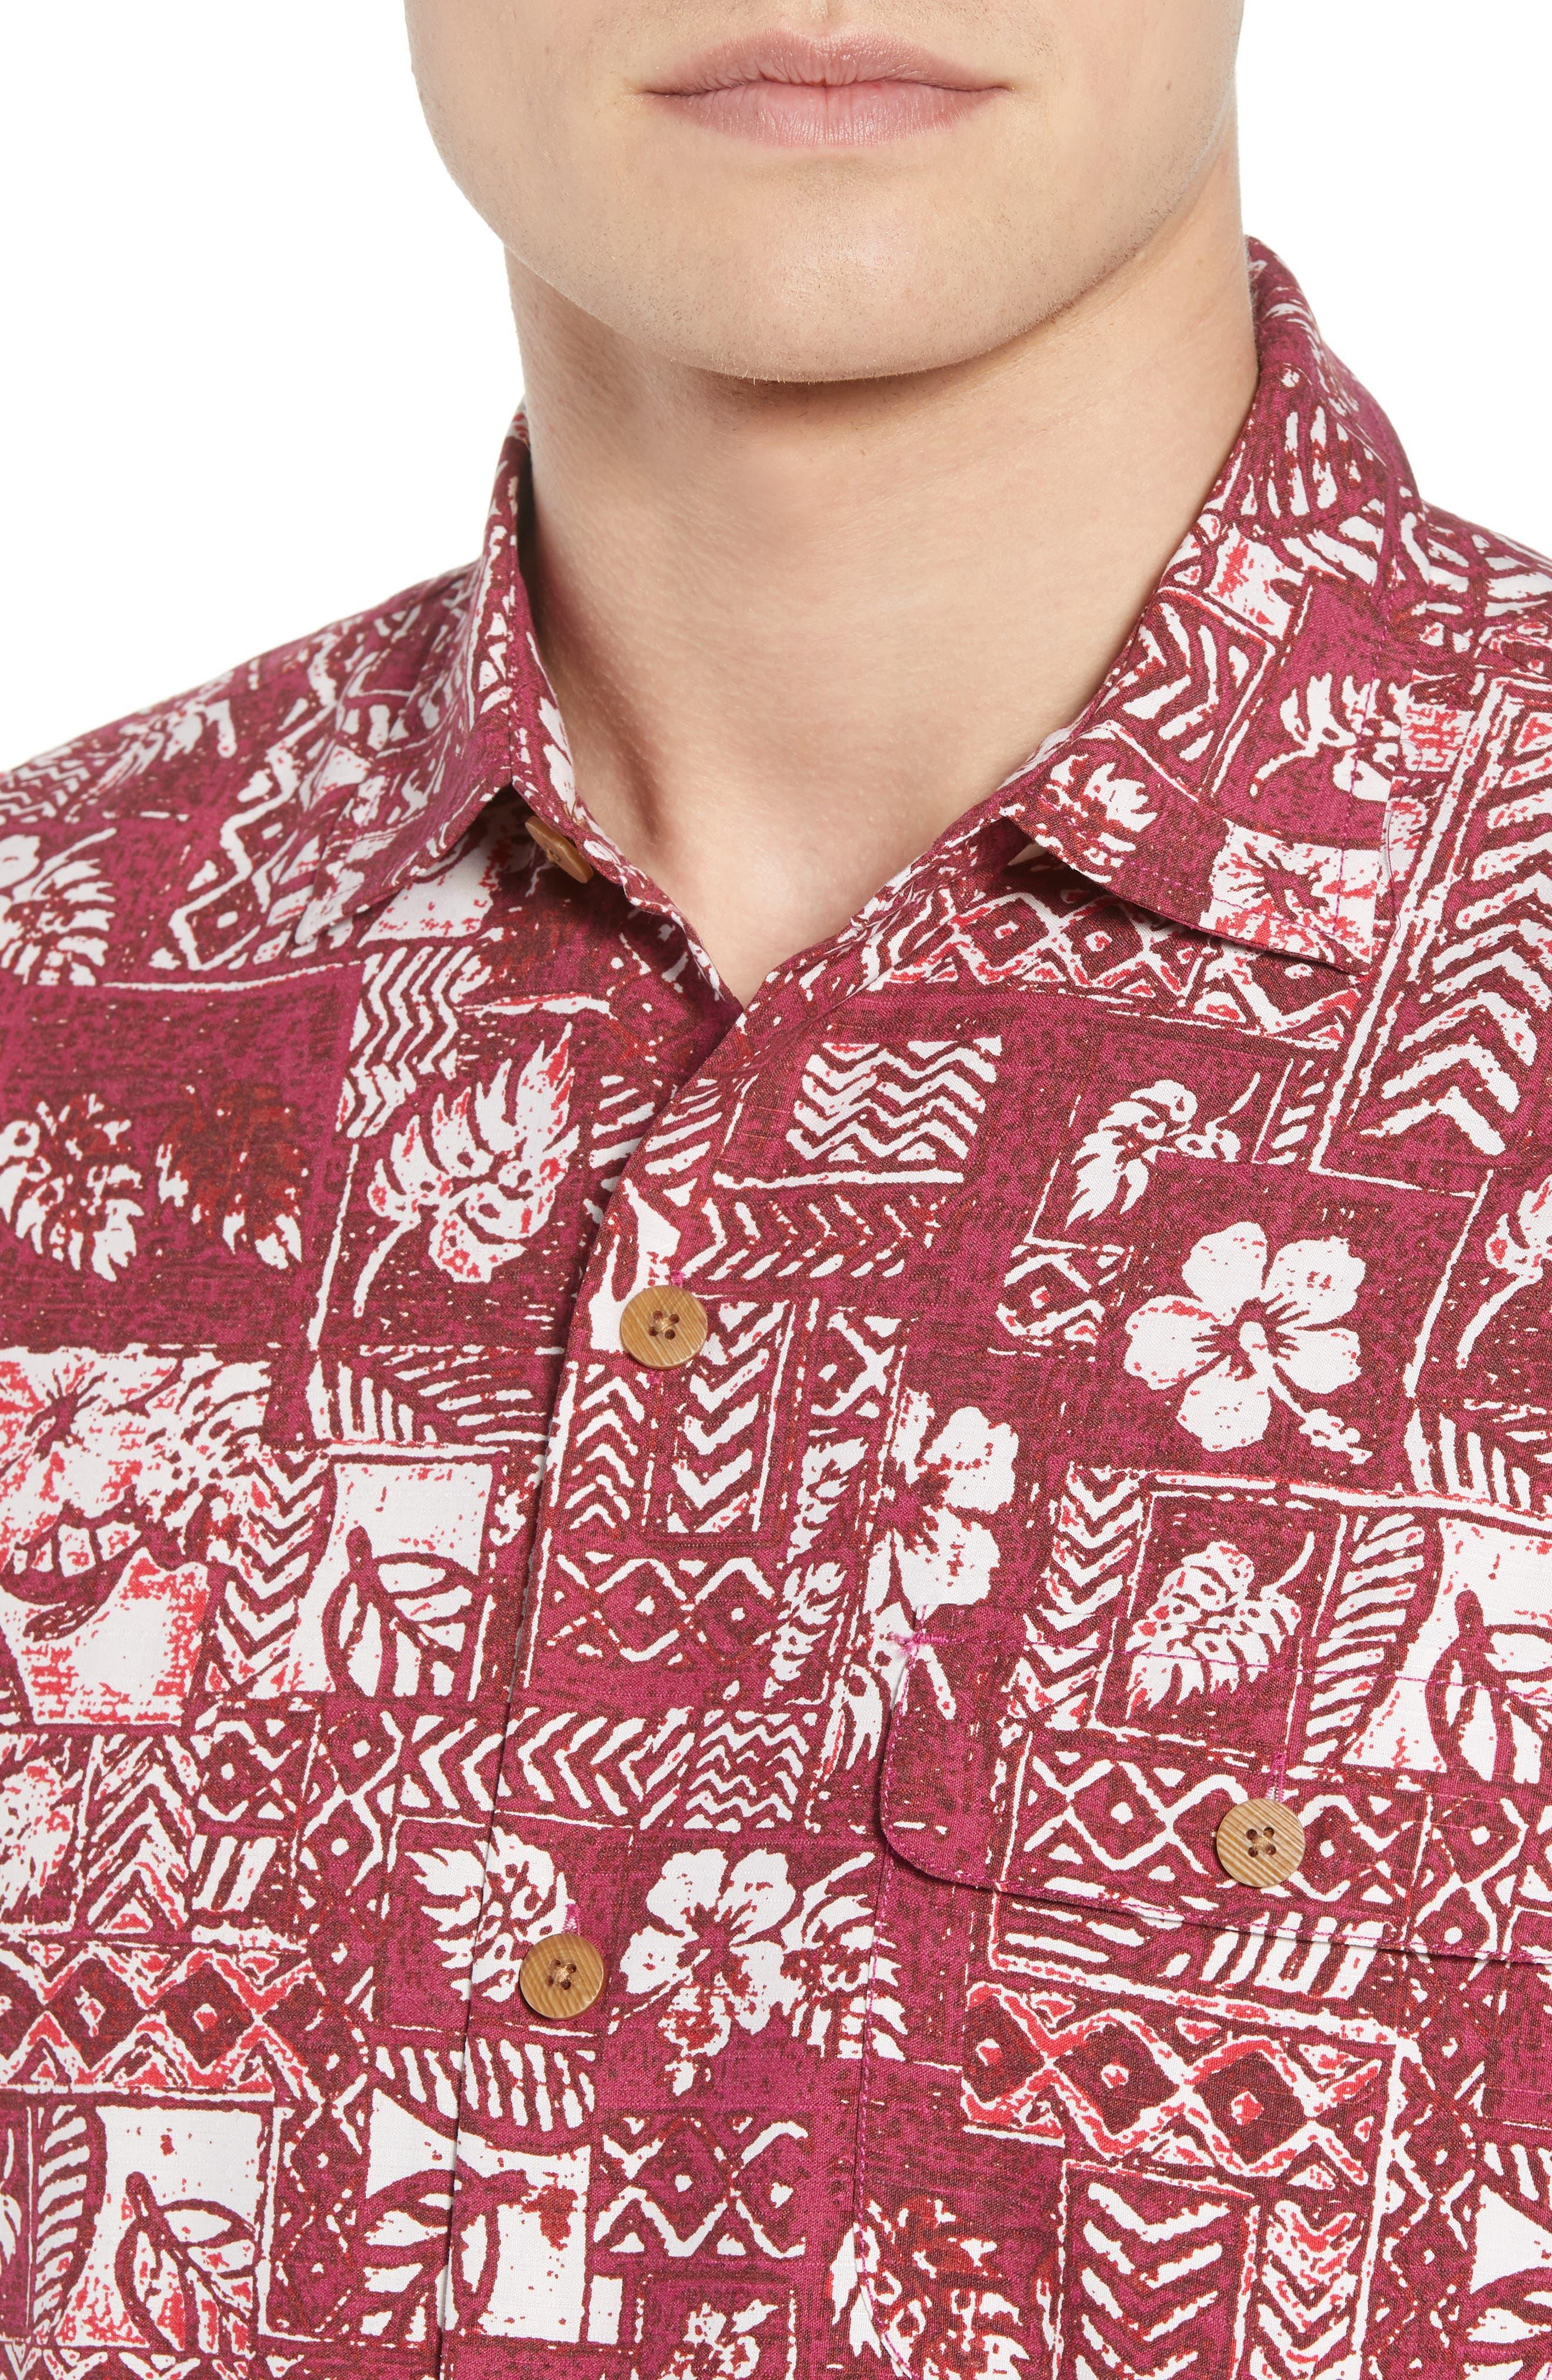 Veracruz Border Tiles Silk Blend Camp Shirt,                             Alternate thumbnail 4, color,                             600